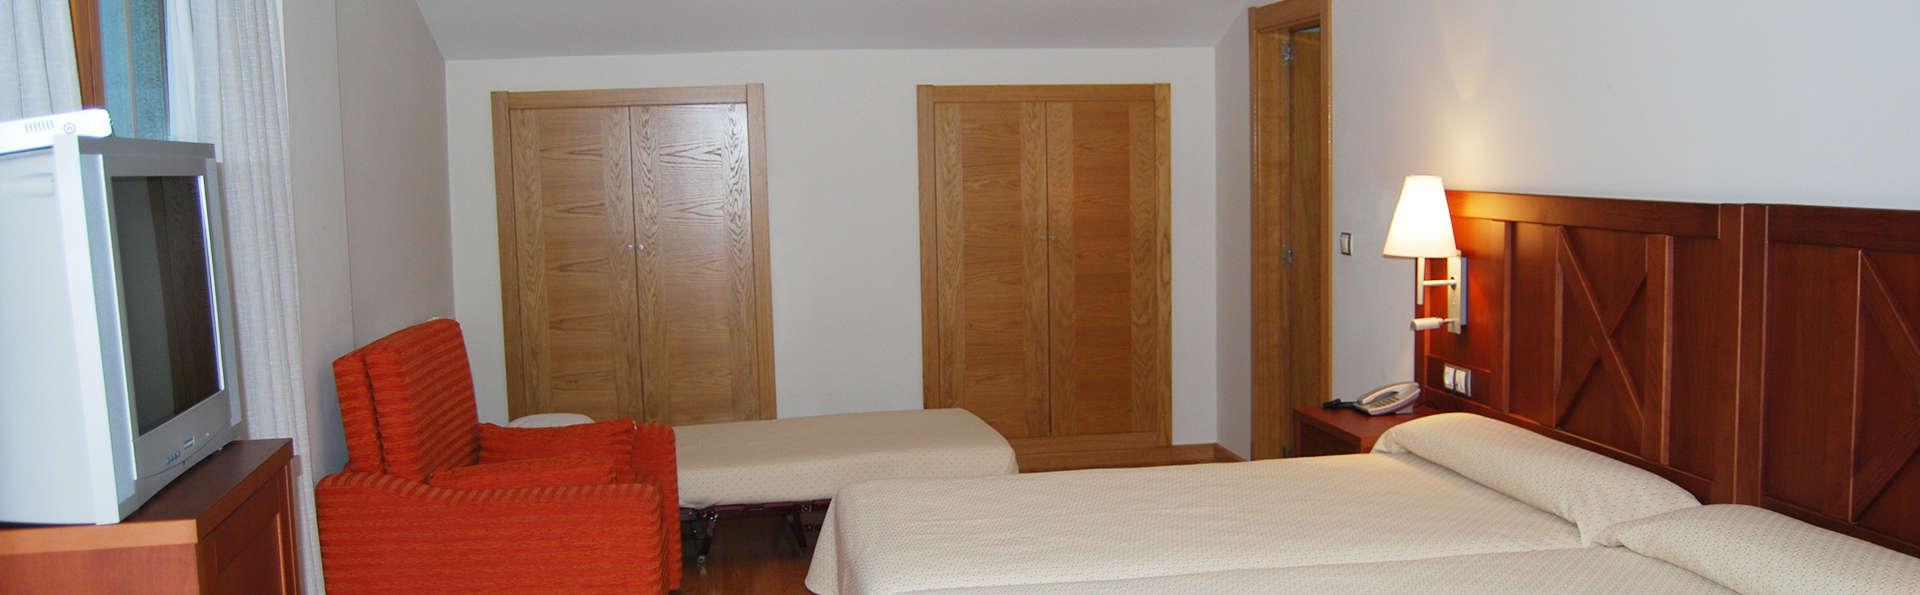 Hotel Meleiros - EDIT_room5.jpg